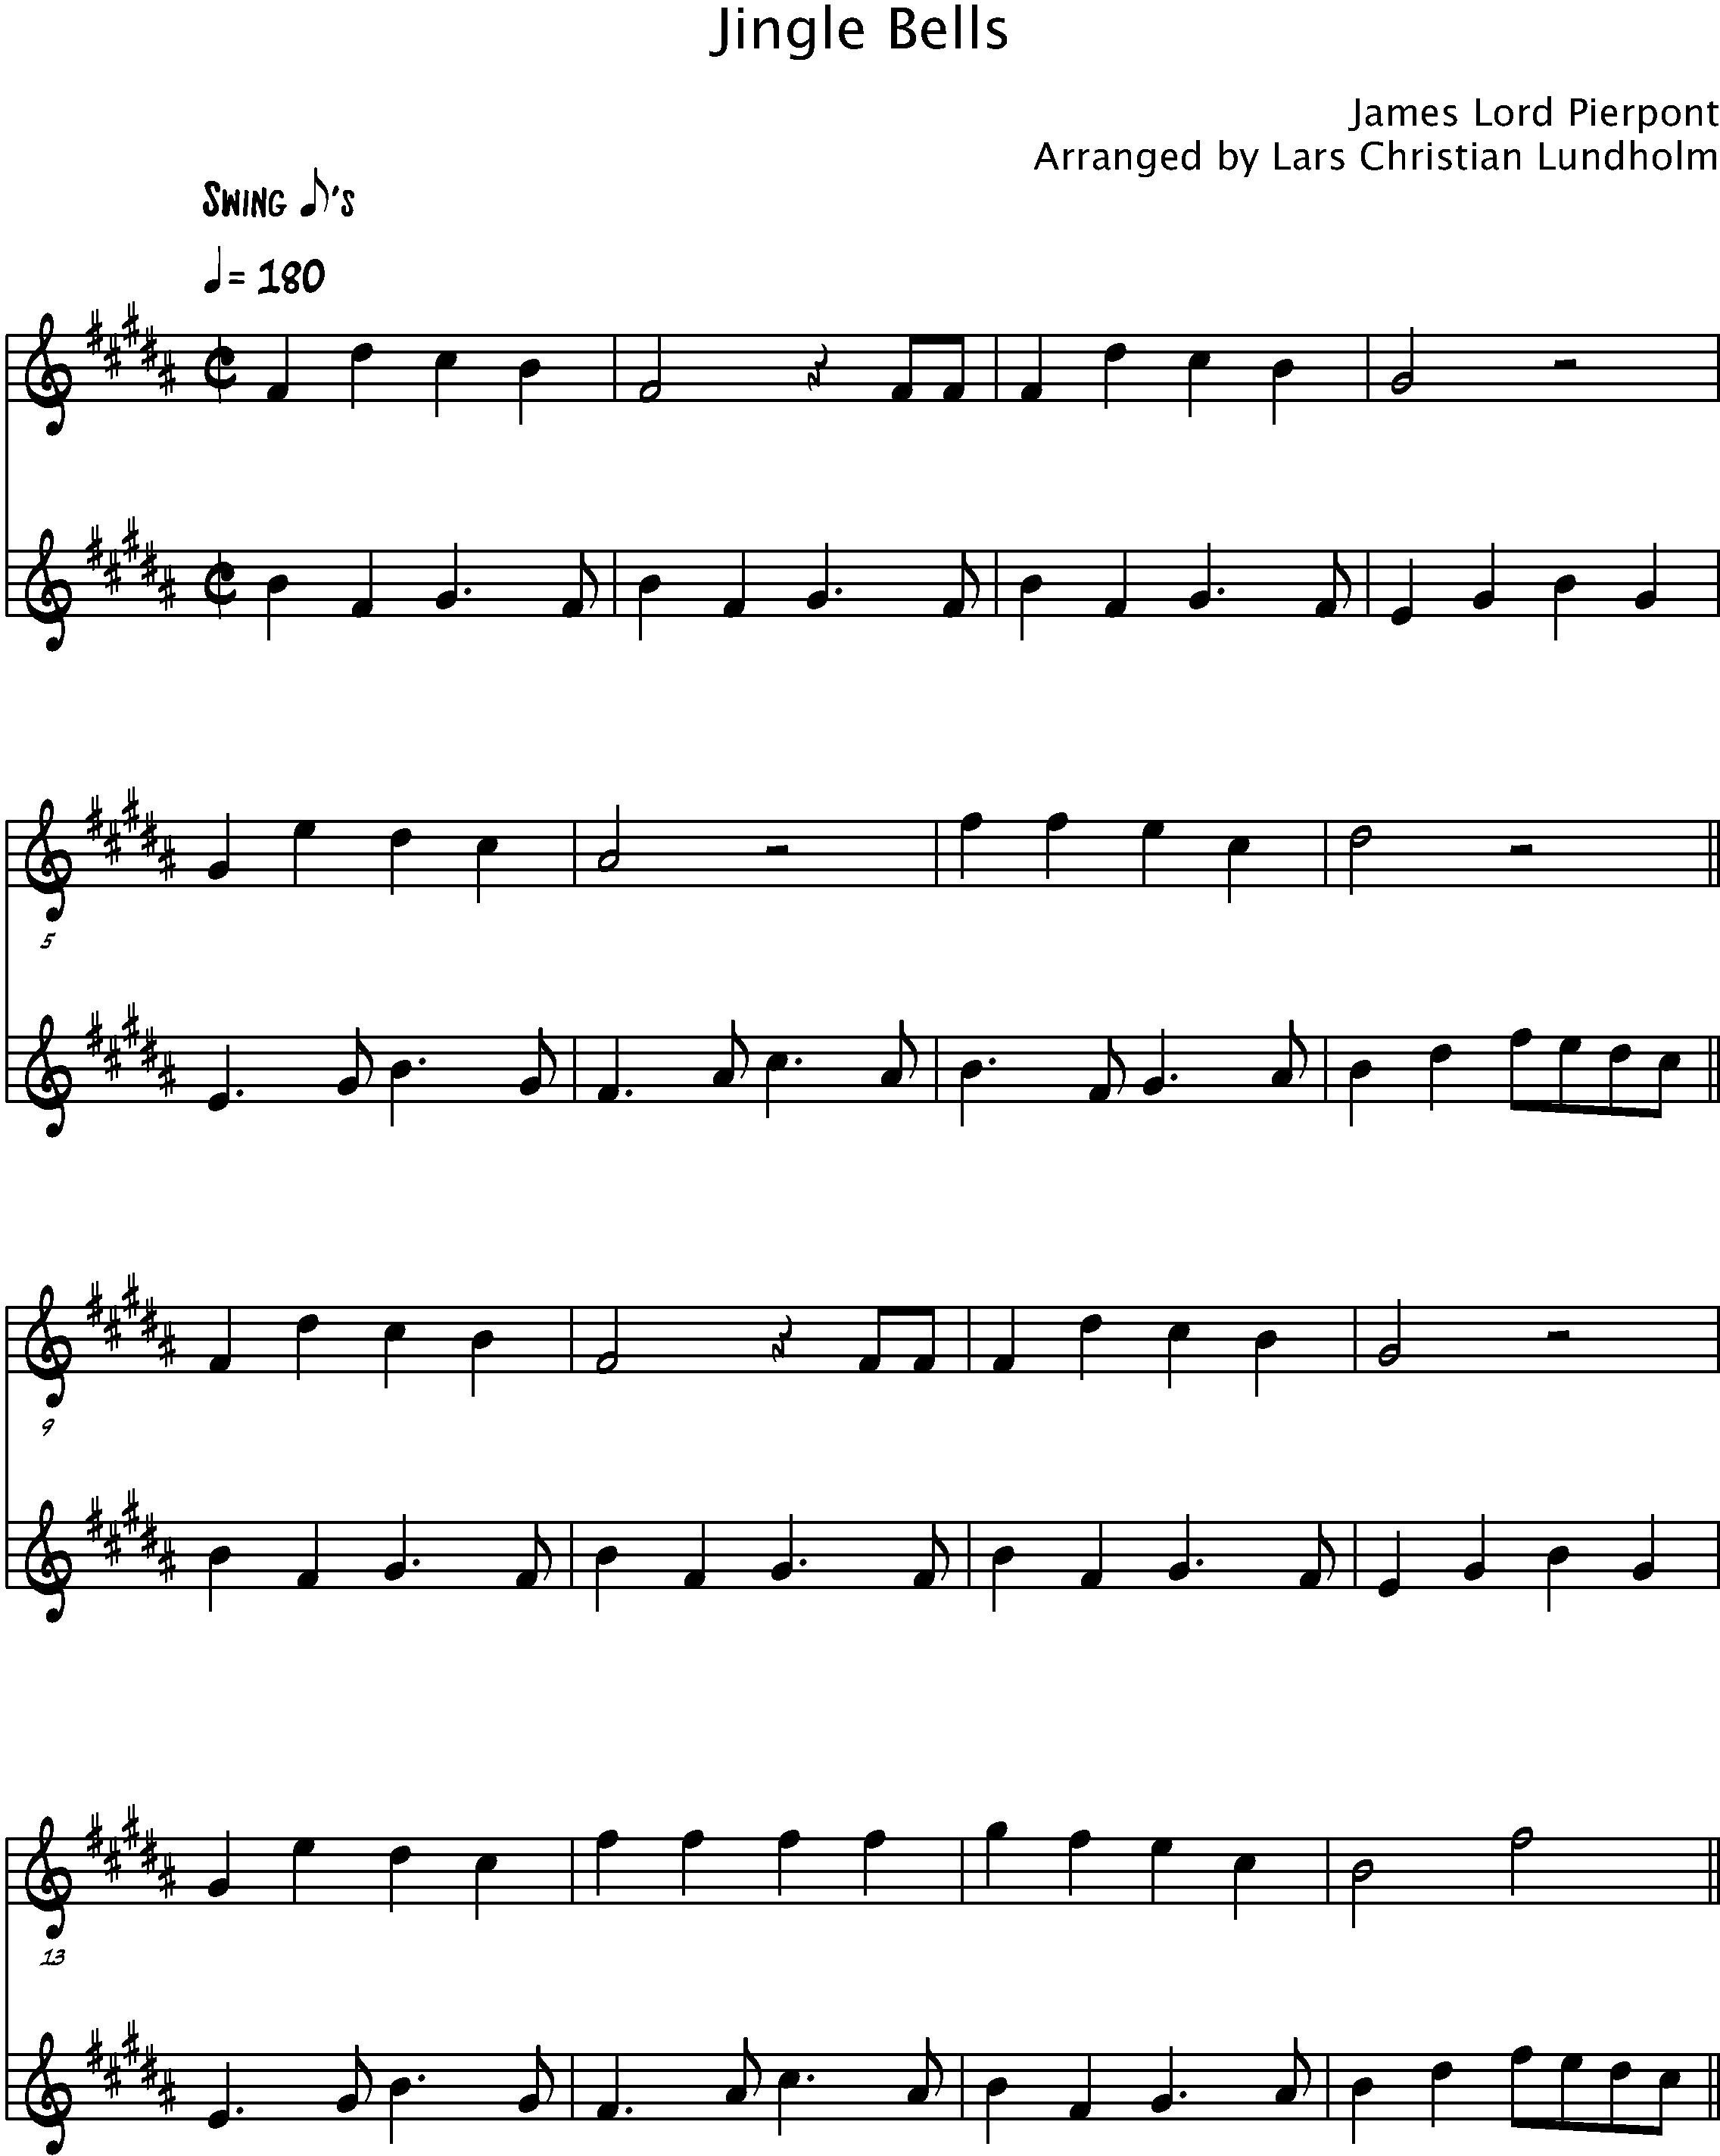 Jingle Bells Sheet Music Alto Saxophone Ibovnathandedecker